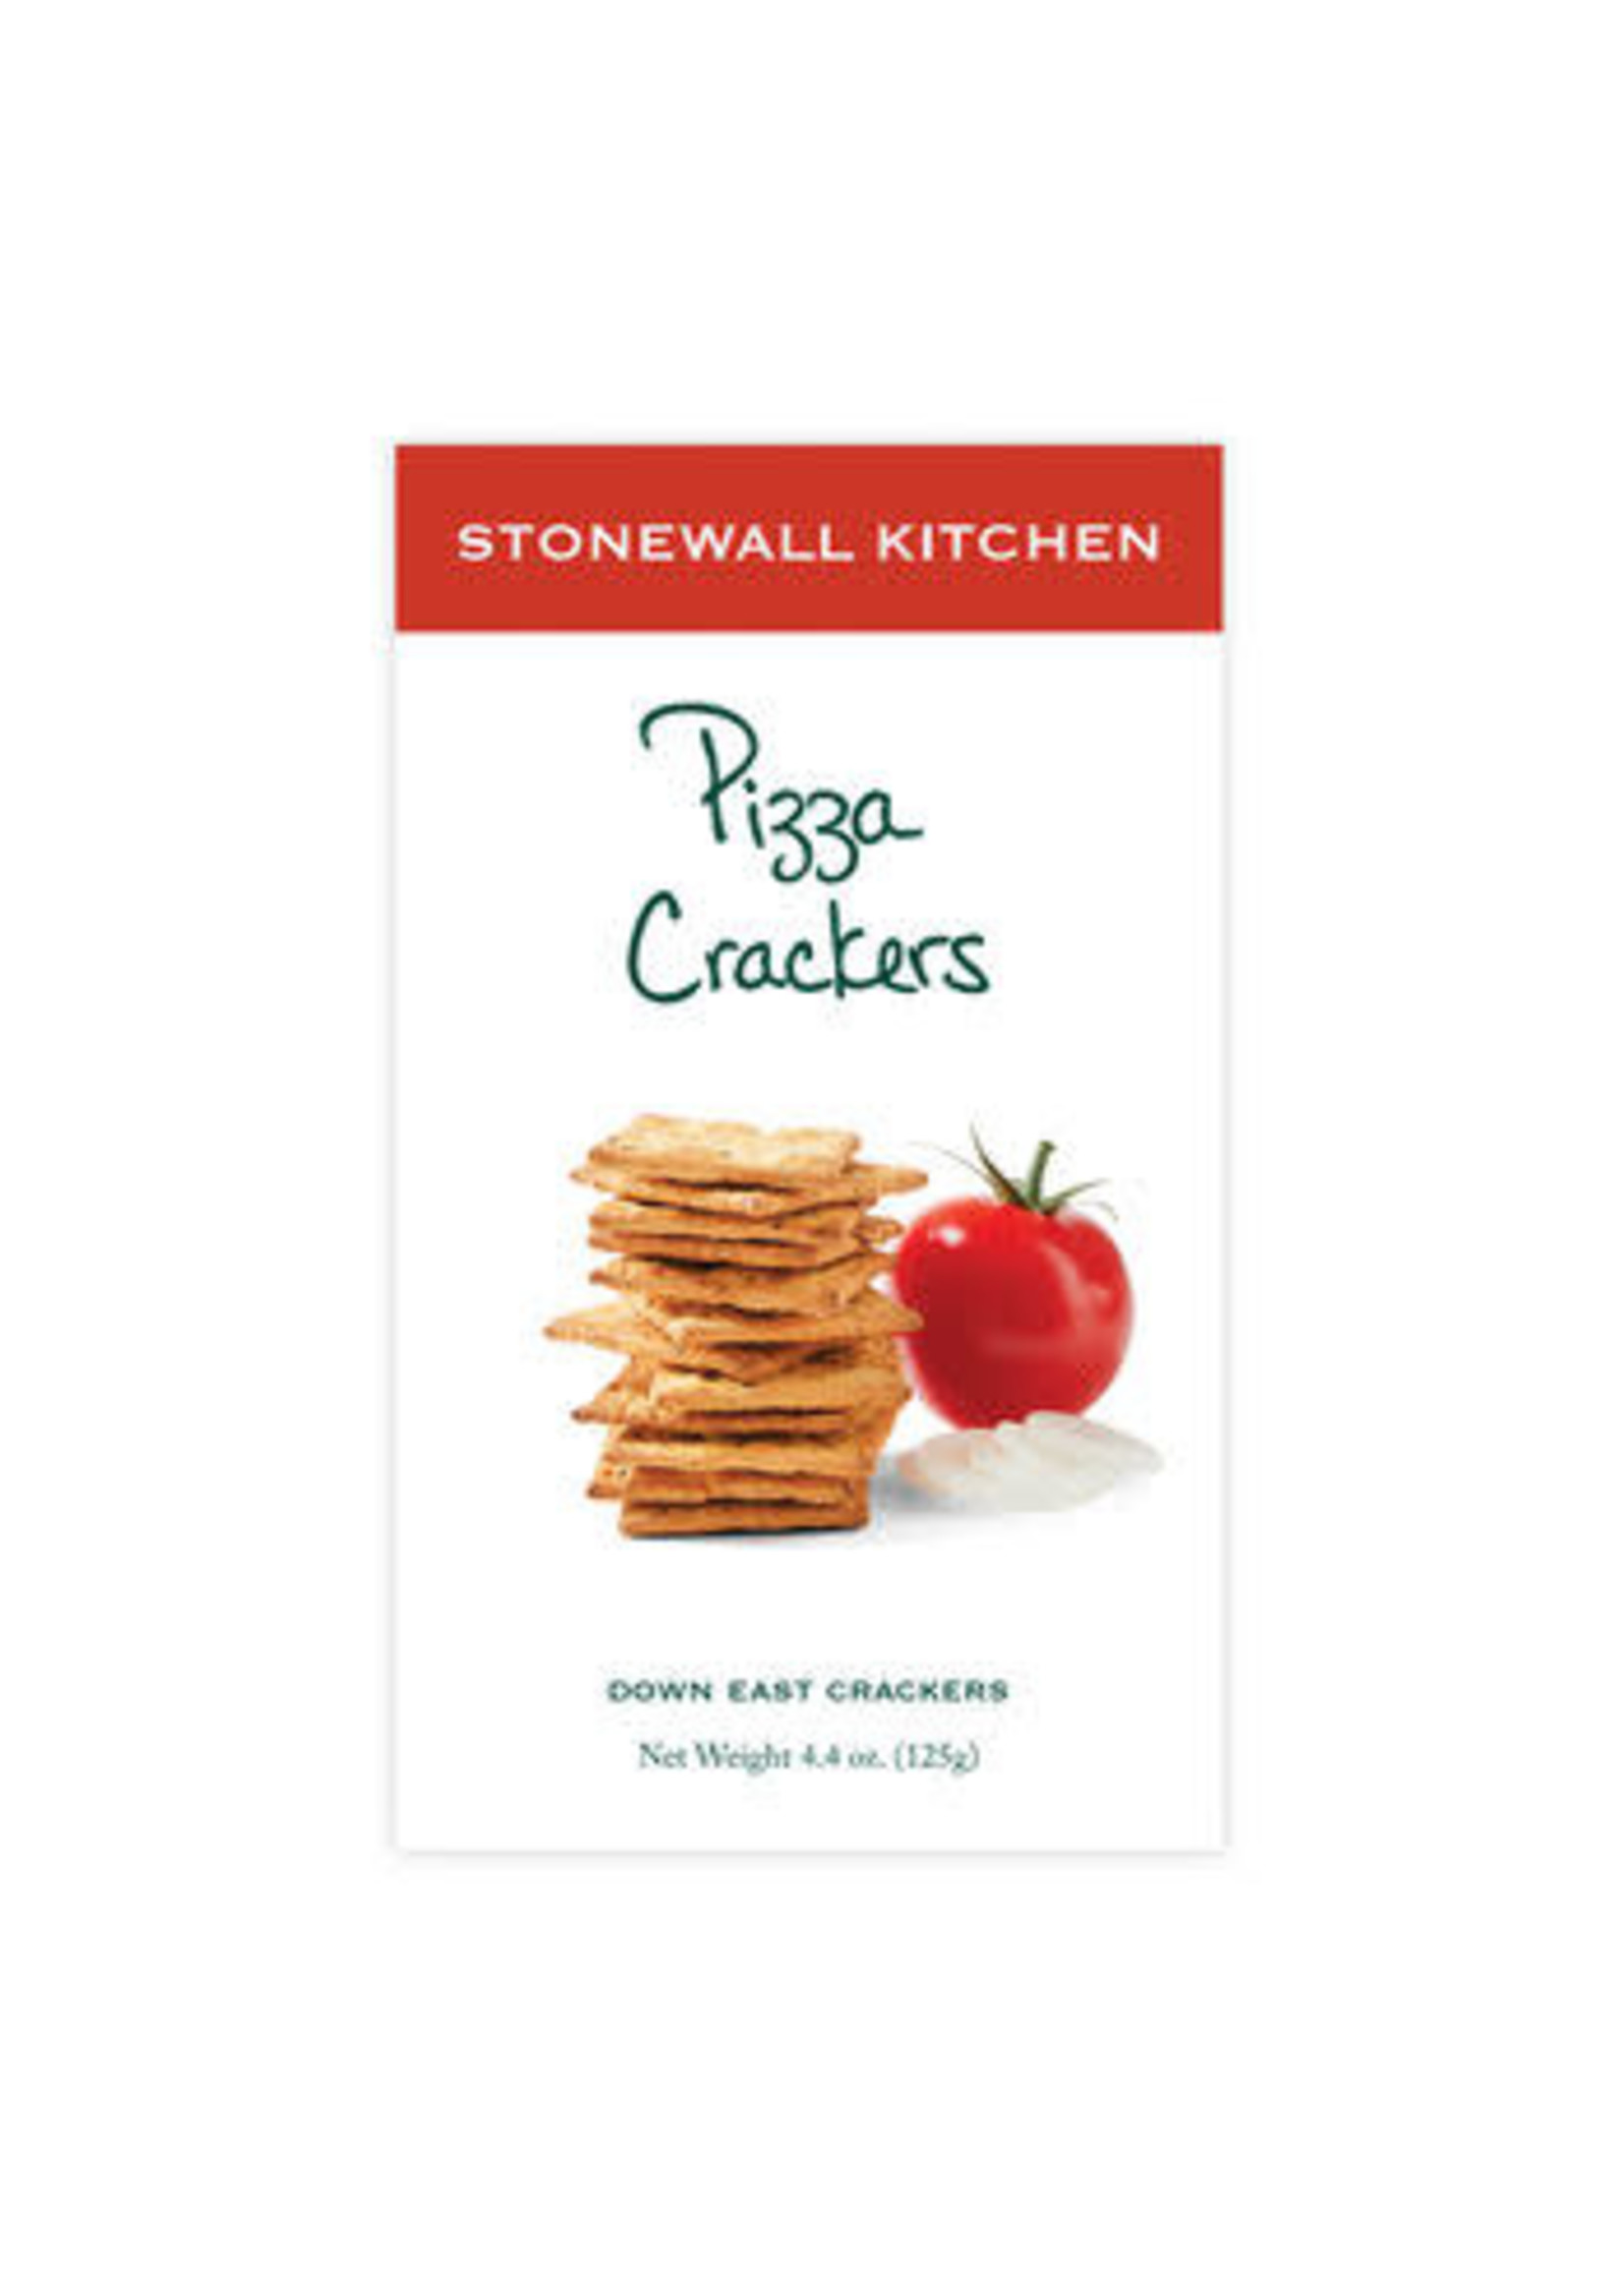 Stonewall Kitchen Pizza Crackers